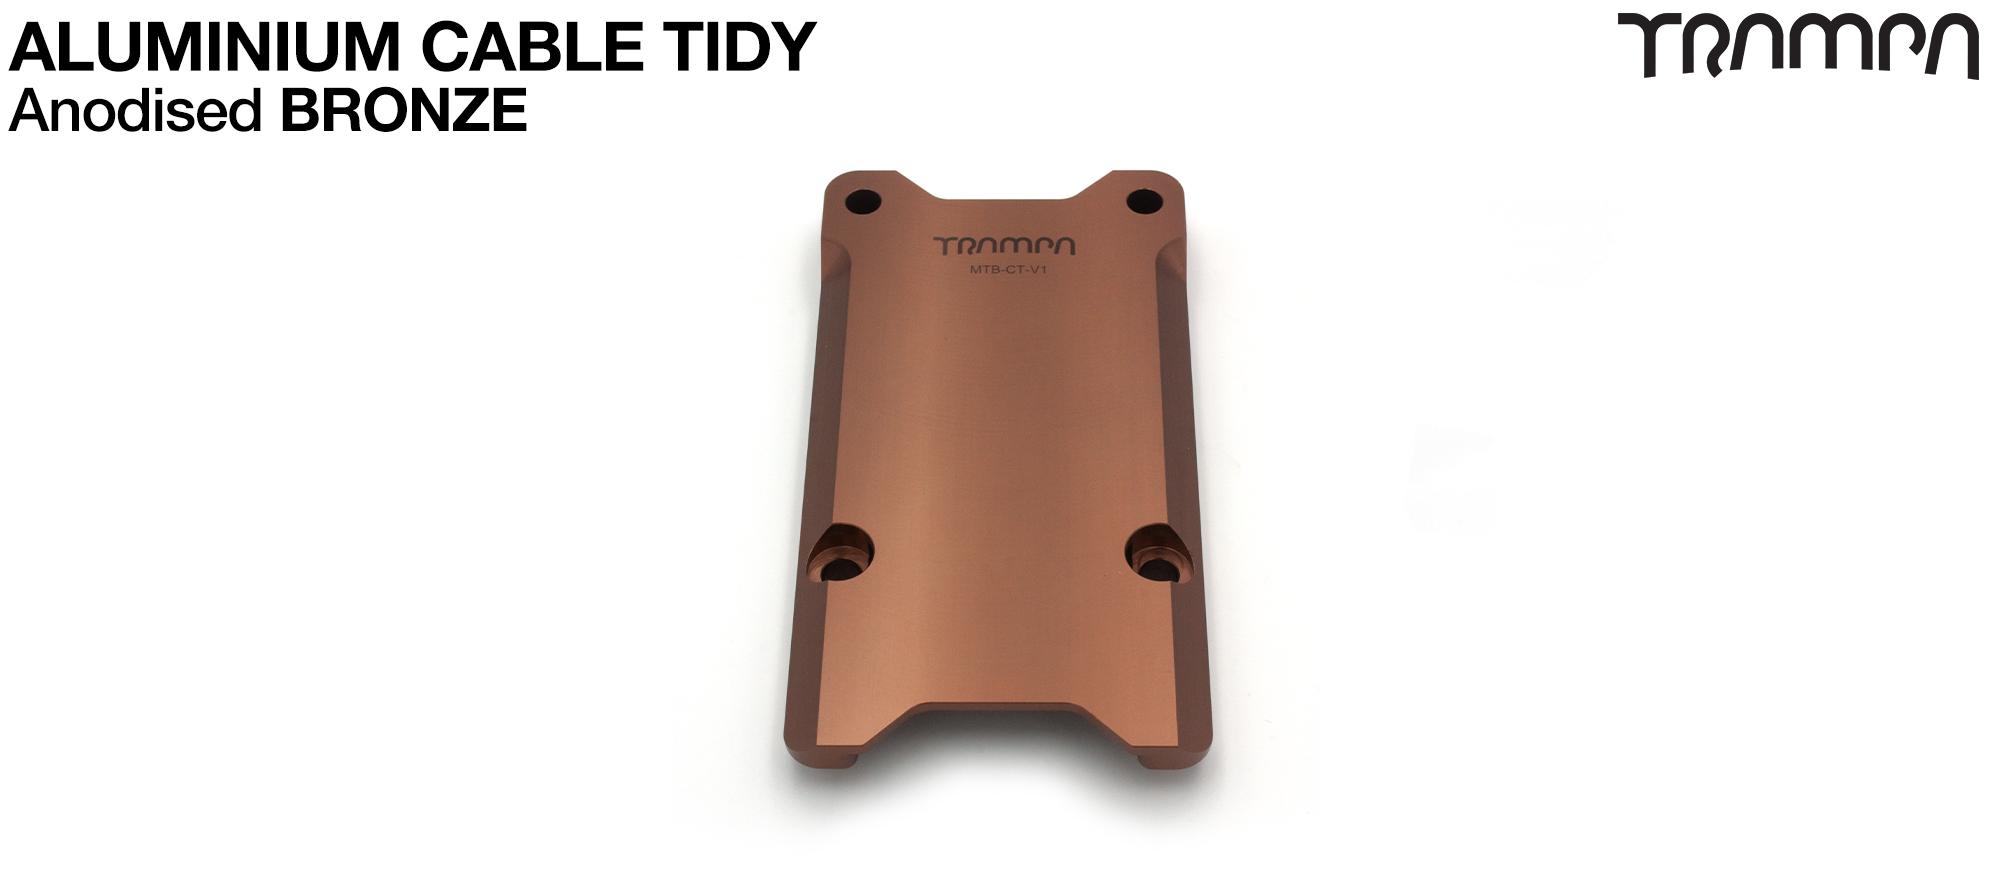 Anodised Aluminum Cable Tidy - BRONZE